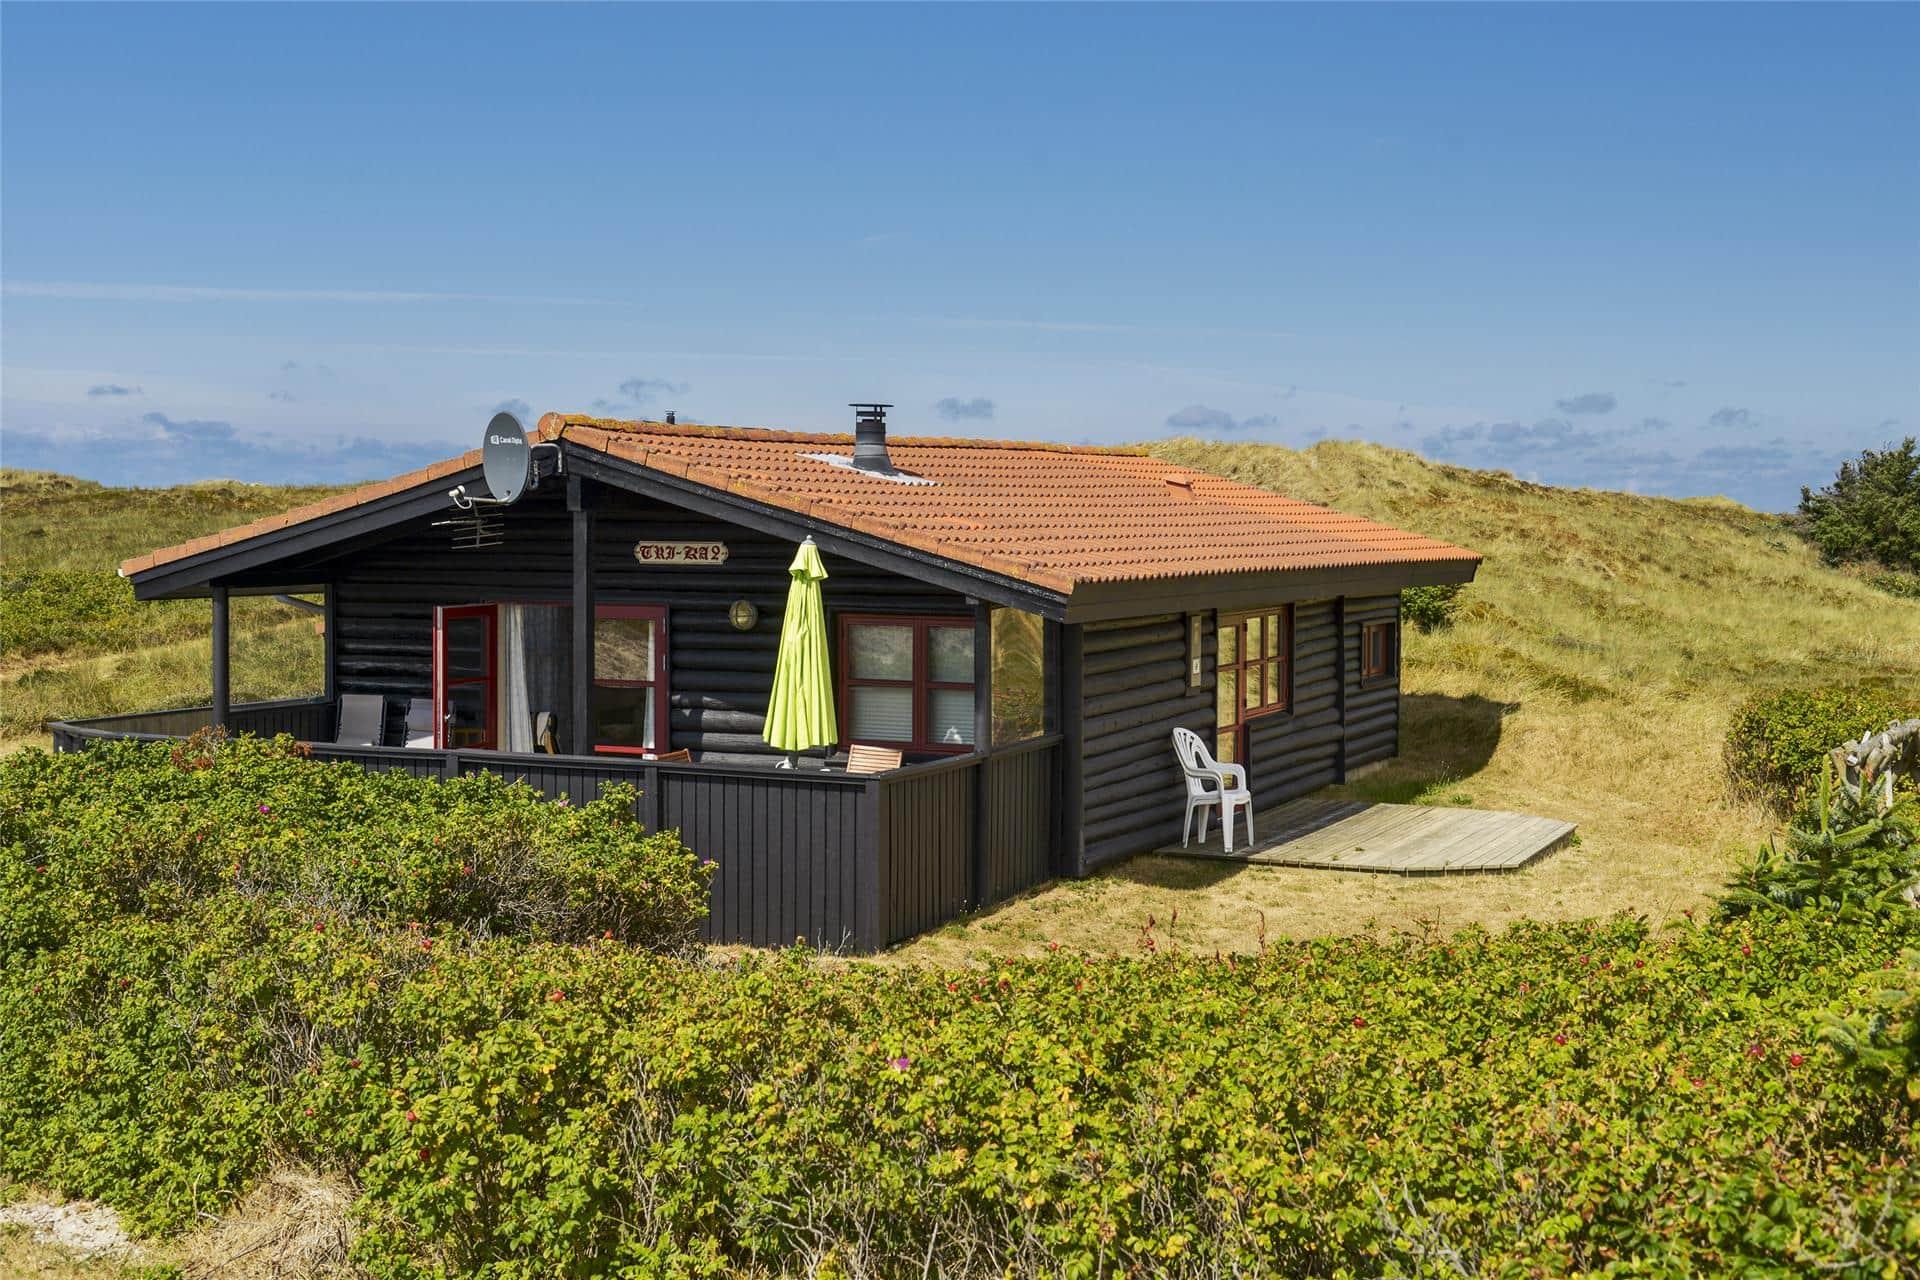 Billede 1-4 Sommerhus 217, Trikavej 8, DK - 6950 Ringkøbing